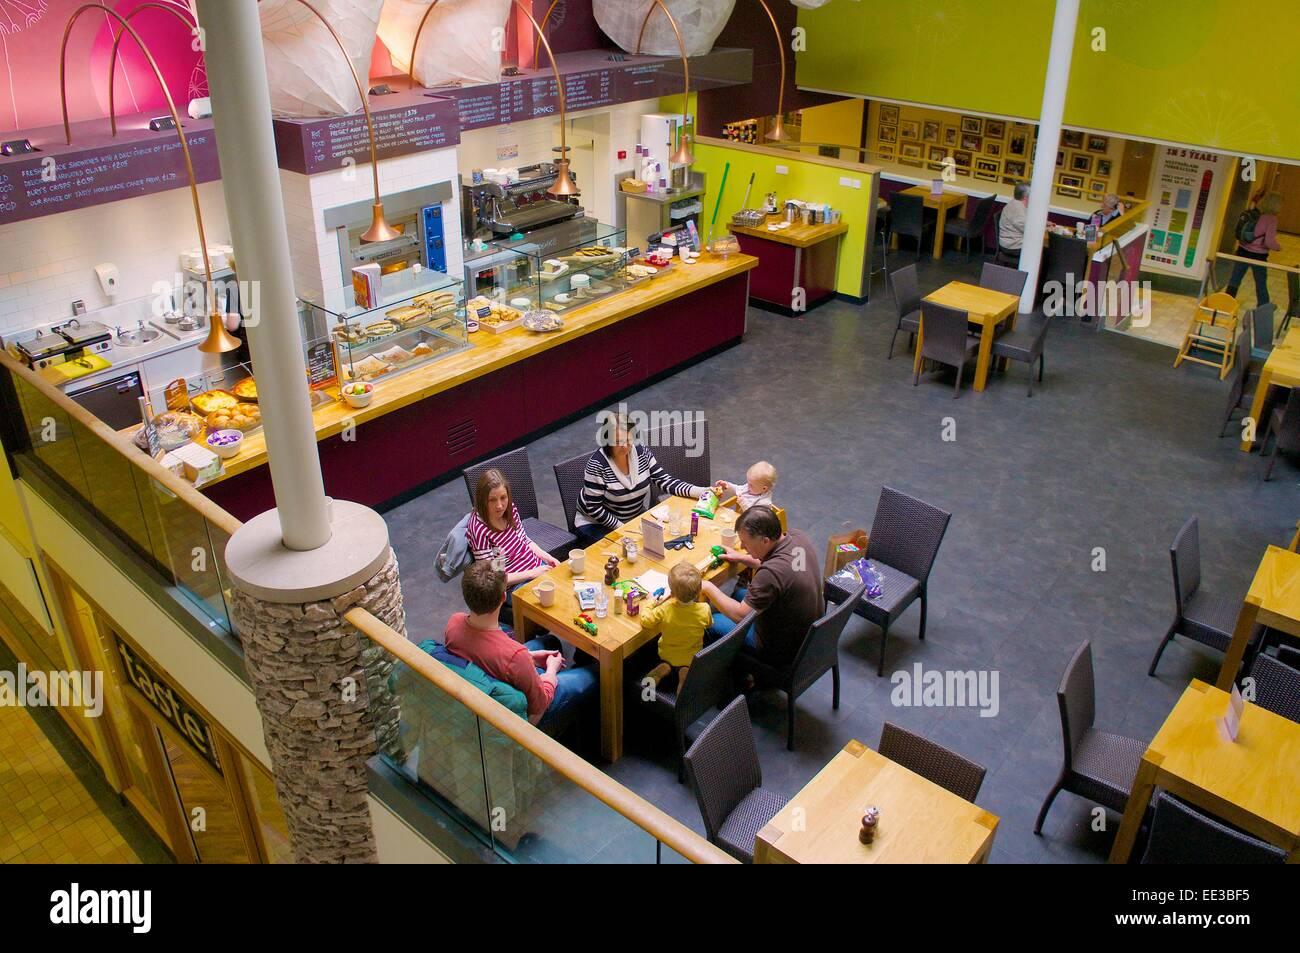 Rheged Cafe Pod, Rheged lakeland heritage centre, Penrith, Eden Valley, Cumbria, England, UK. - Stock Image